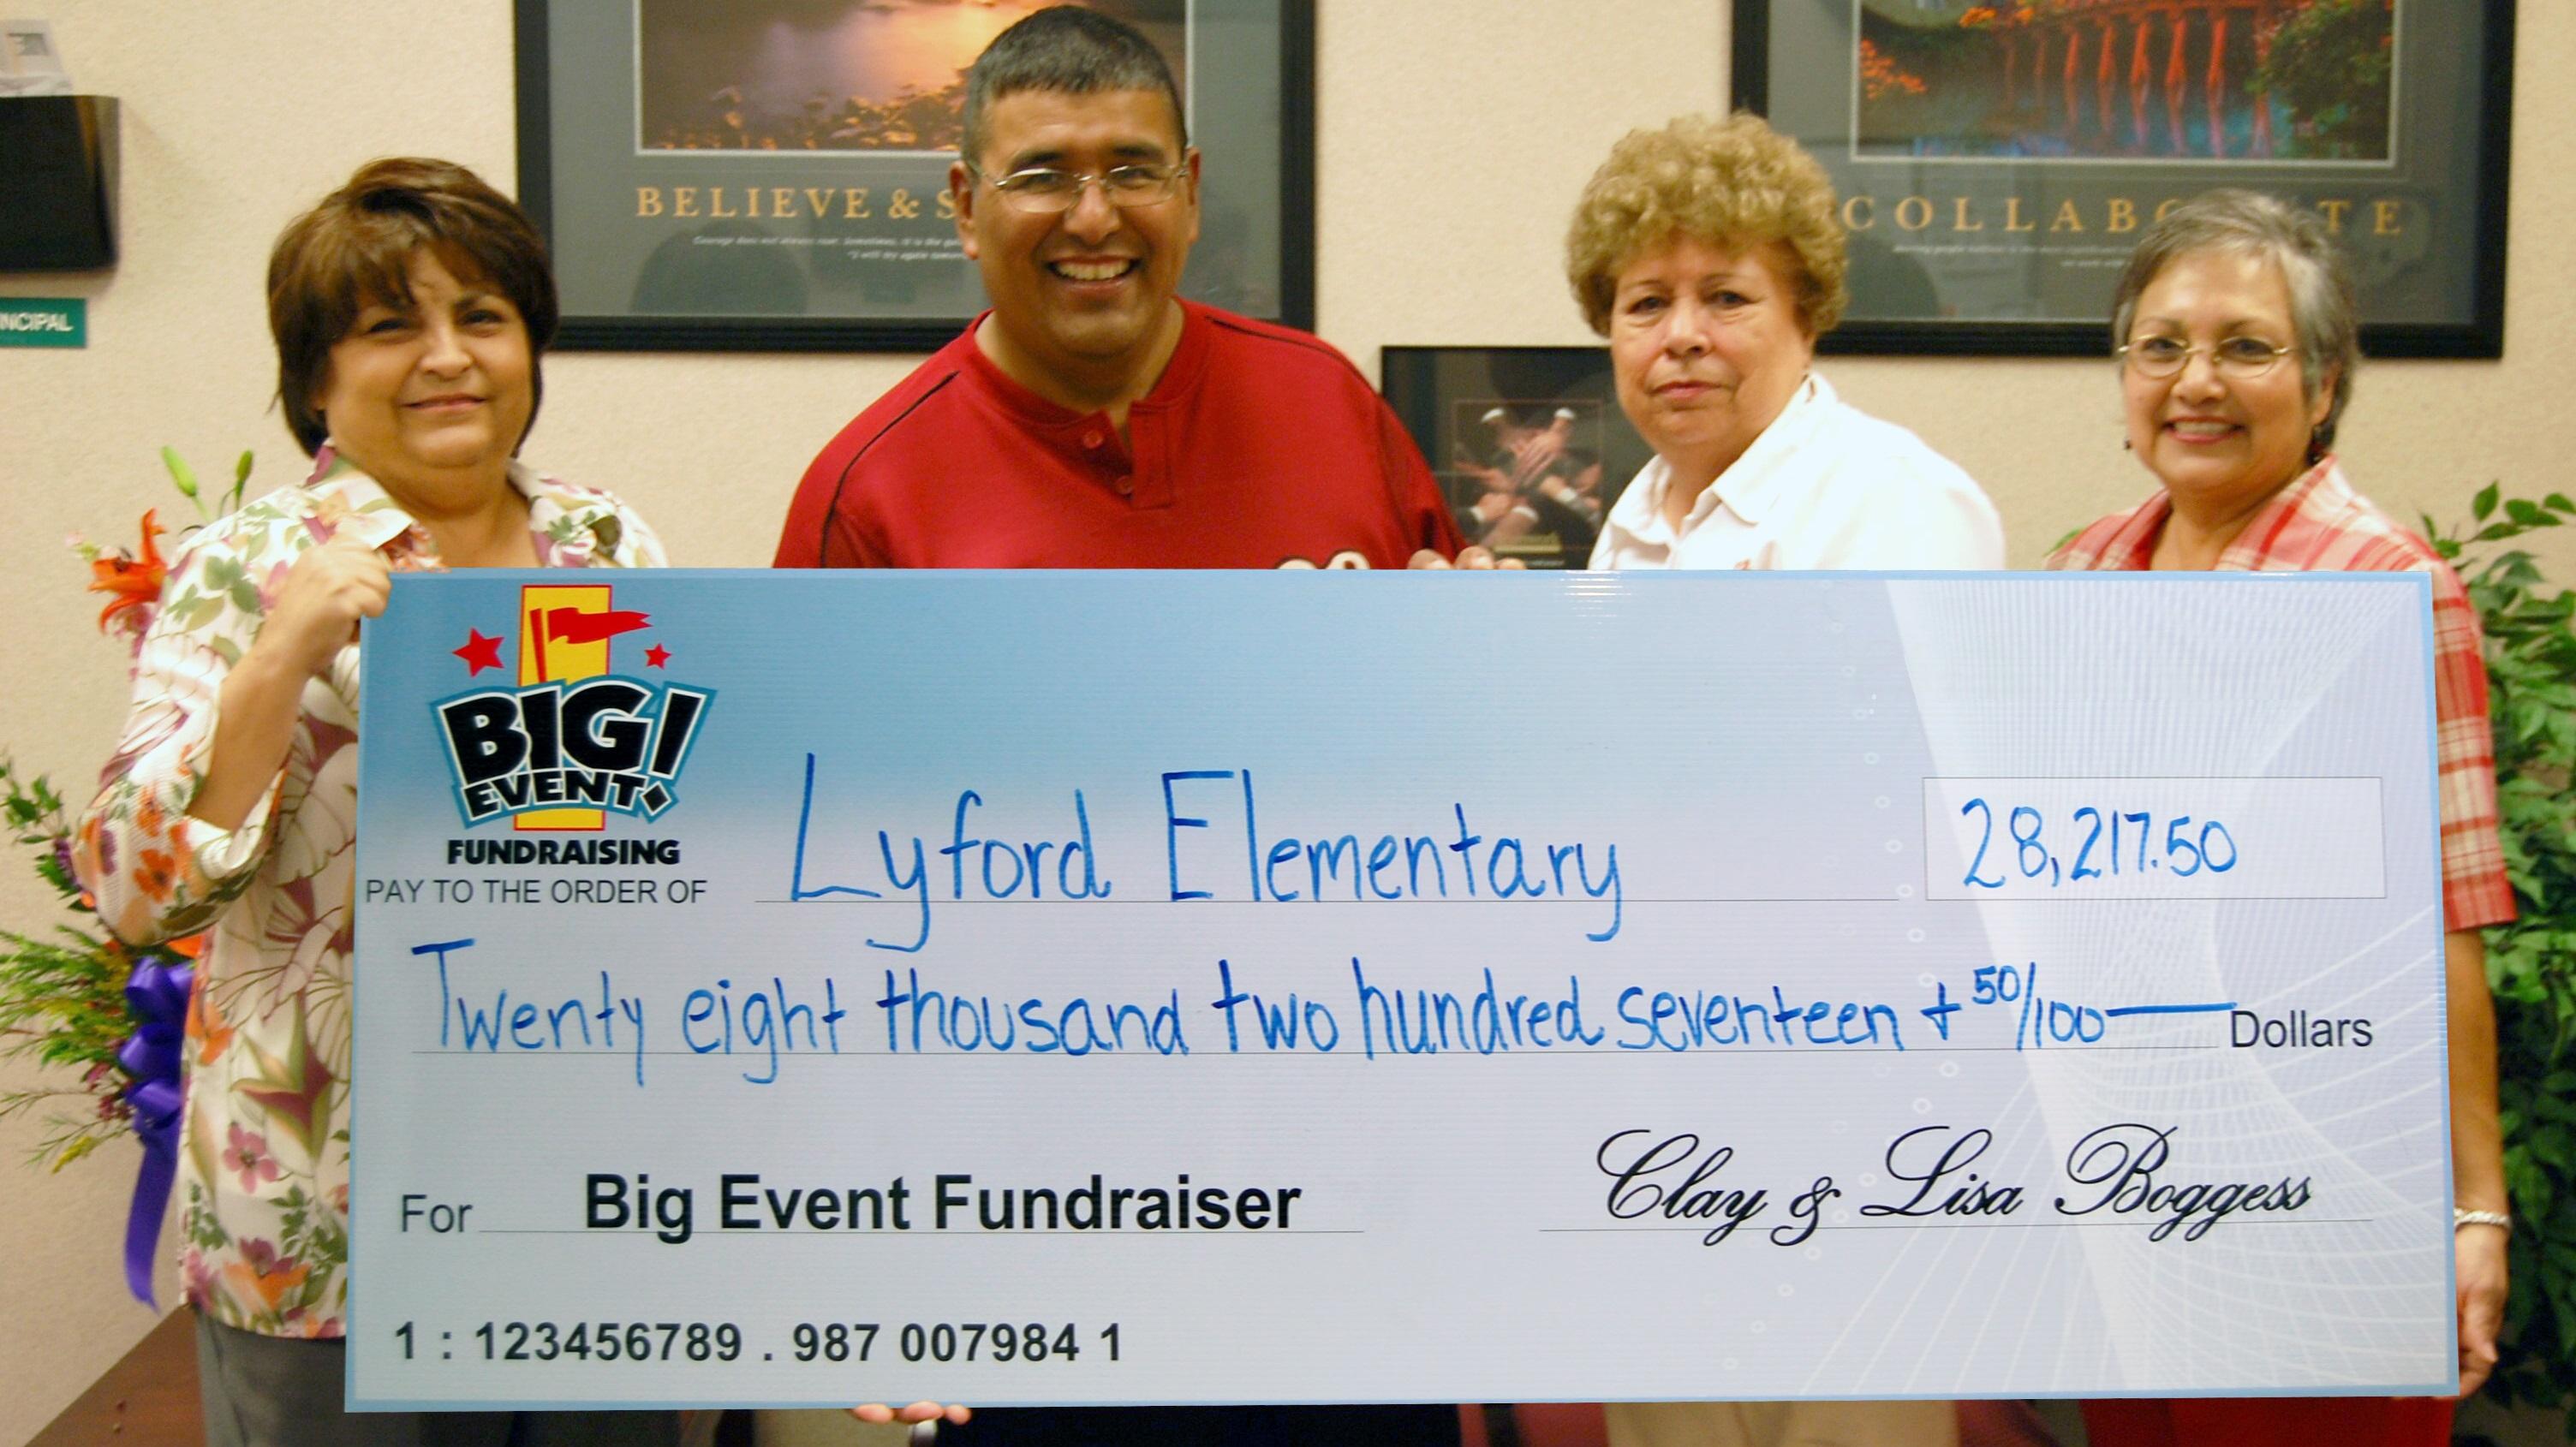 Lyford Elementary School fundraising team holding check